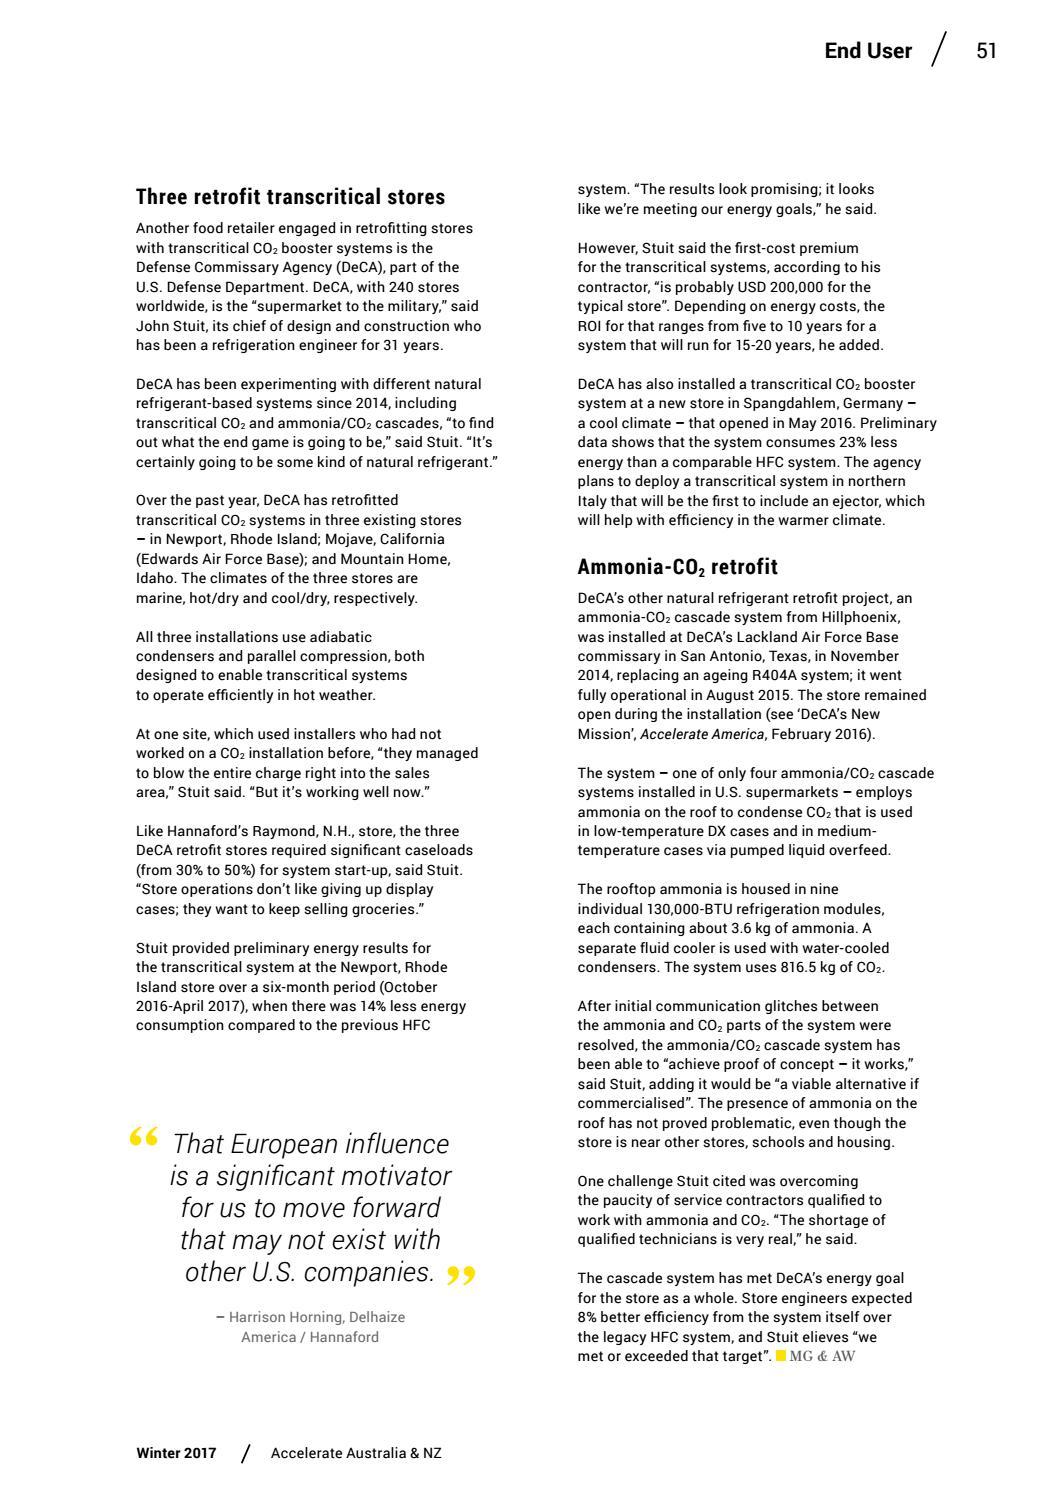 Accelerate Australia & NZ #6 Winter 2017 by shecco - issuu